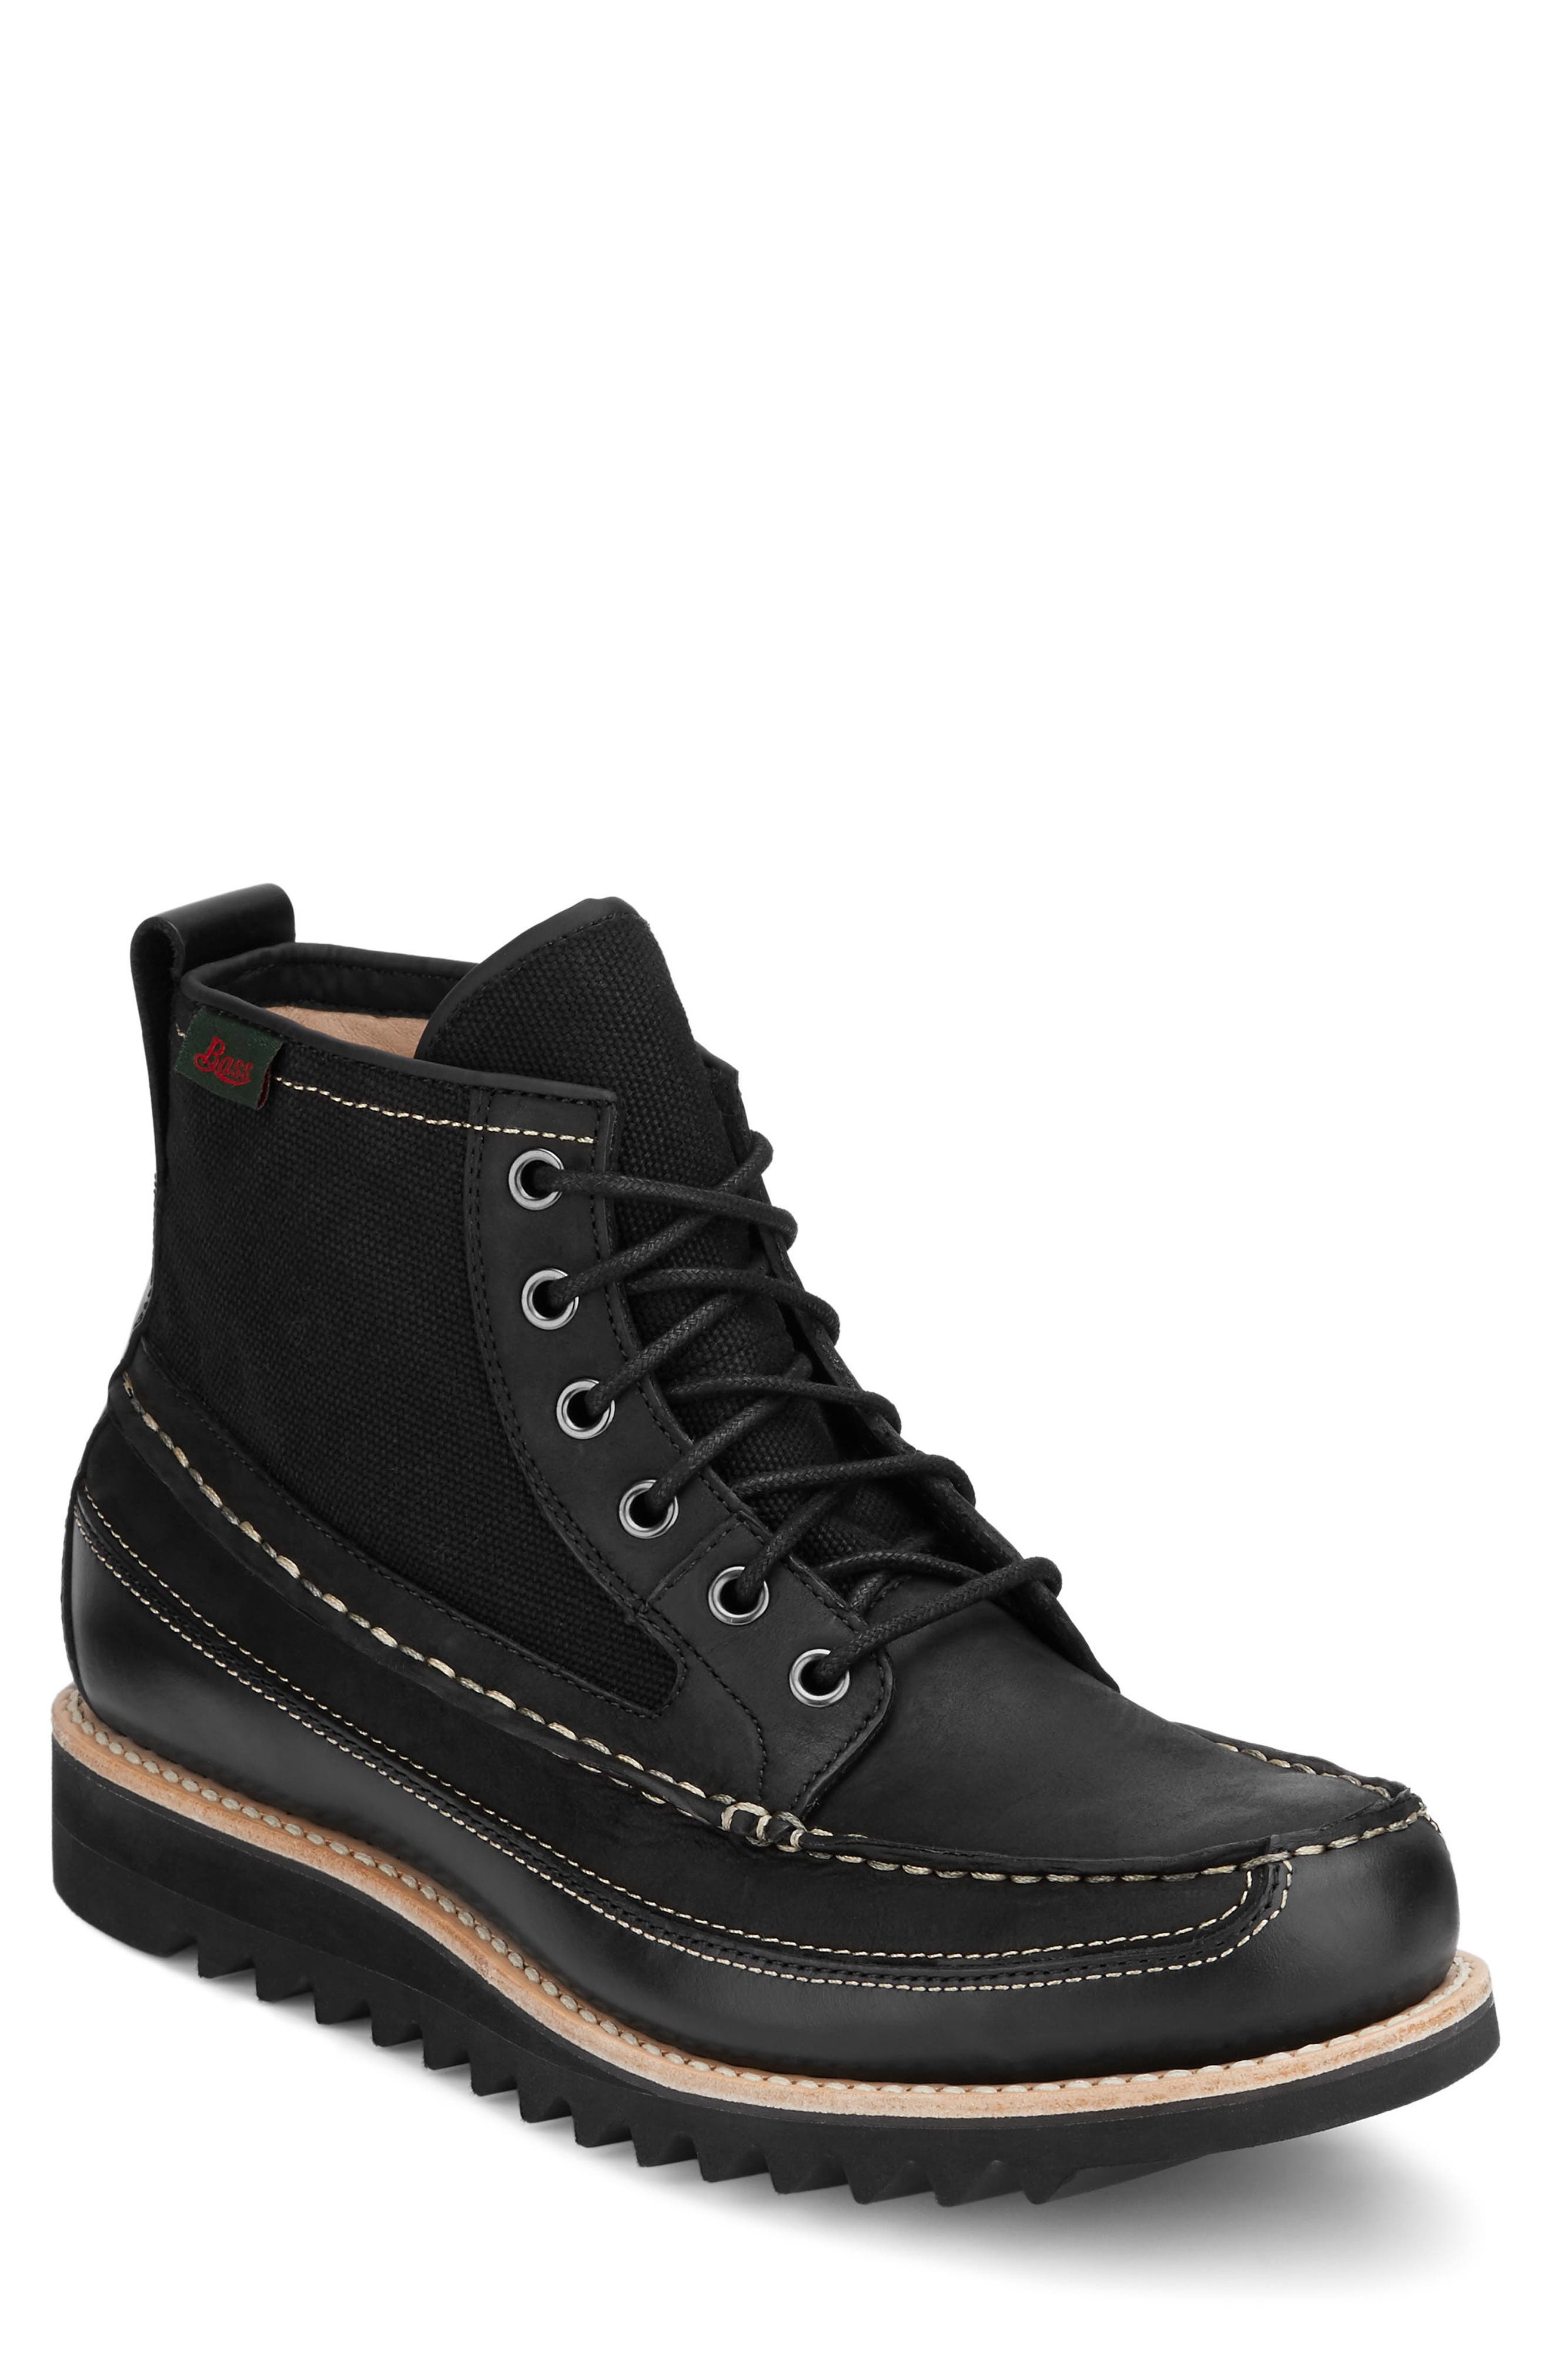 Nickson Razor Moc Toe Boot,                         Main,                         color, Black